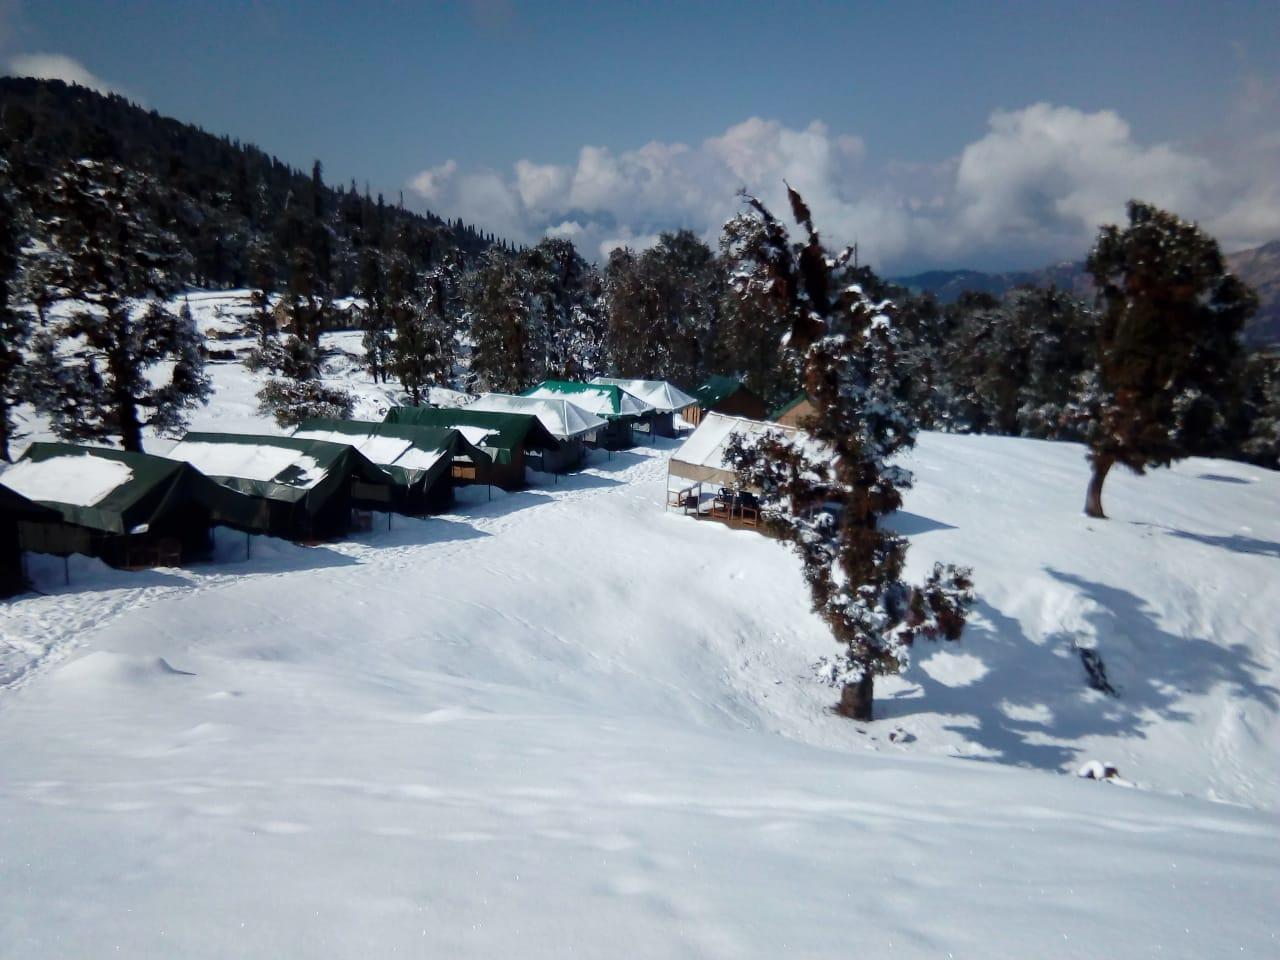 chandrashila campsite